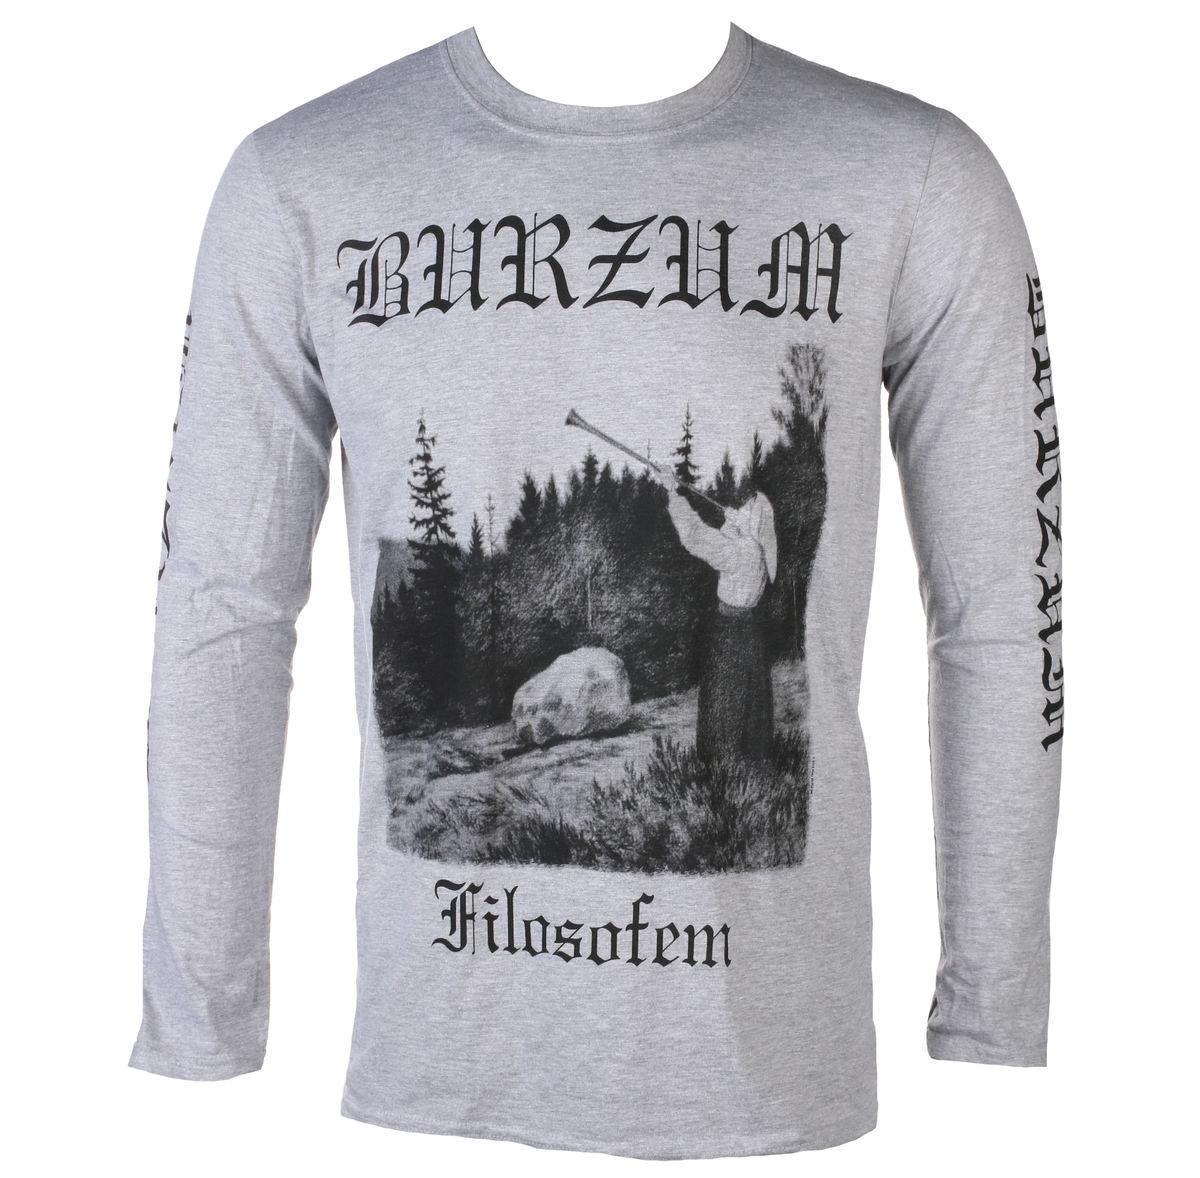 828b4a06c2a7 tričko pánské s dlouhým rukávem BURZUM - FILOSOFEM 3 - PLASTIC HEAD -  PH10860LS - metal-shop.eu